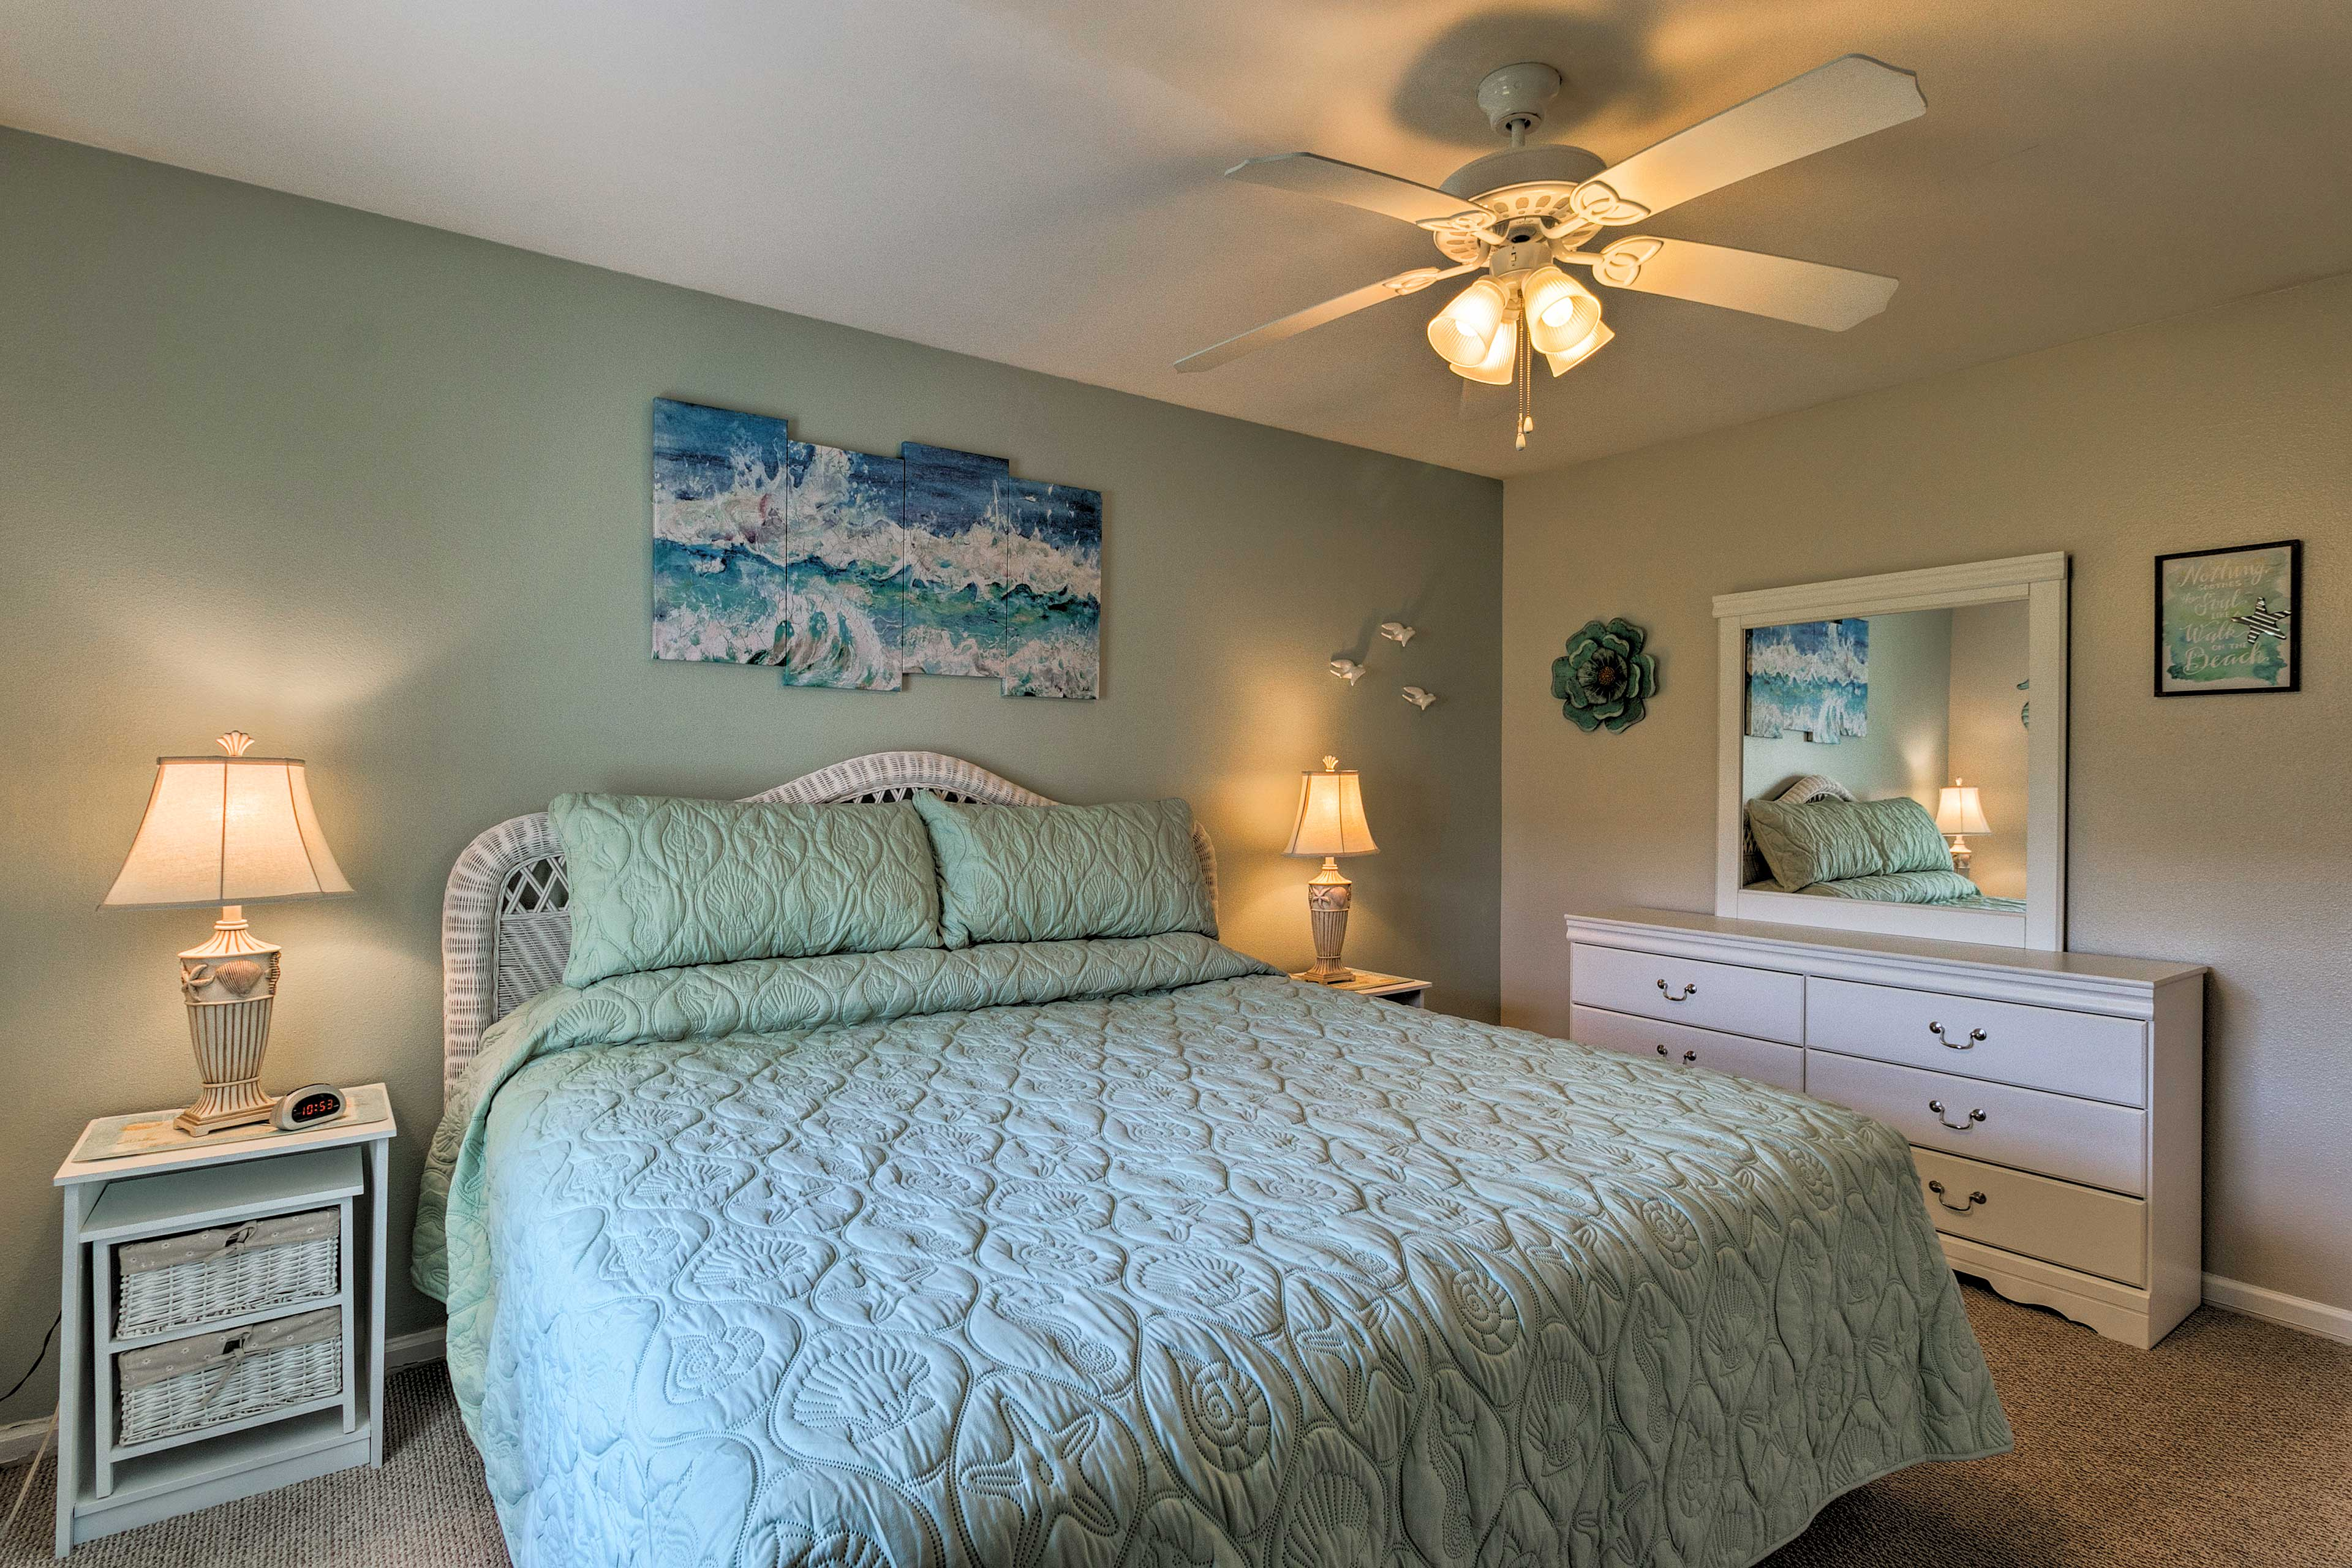 Both bedrooms offer ceiling fans.